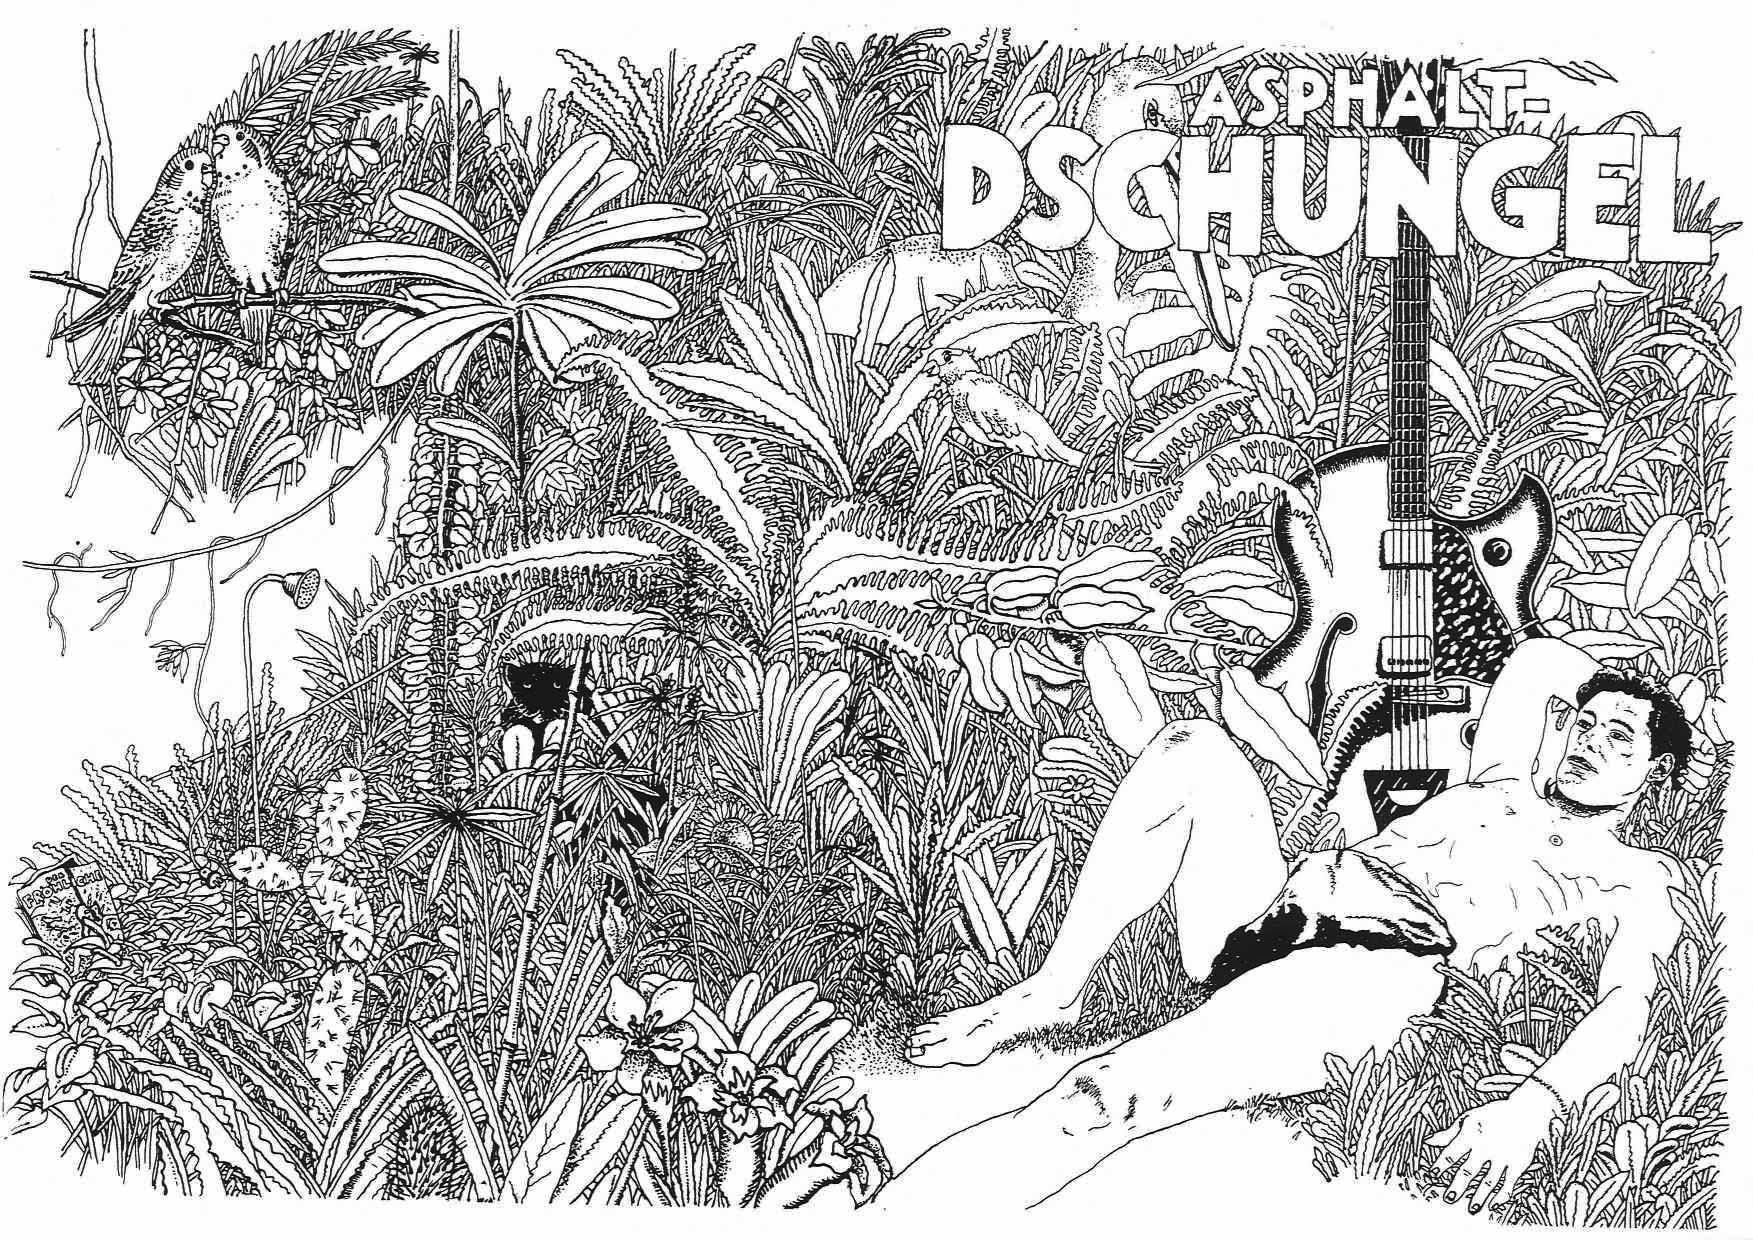 Thomas Hornemann, Asphaltdschungel, 1972/1974